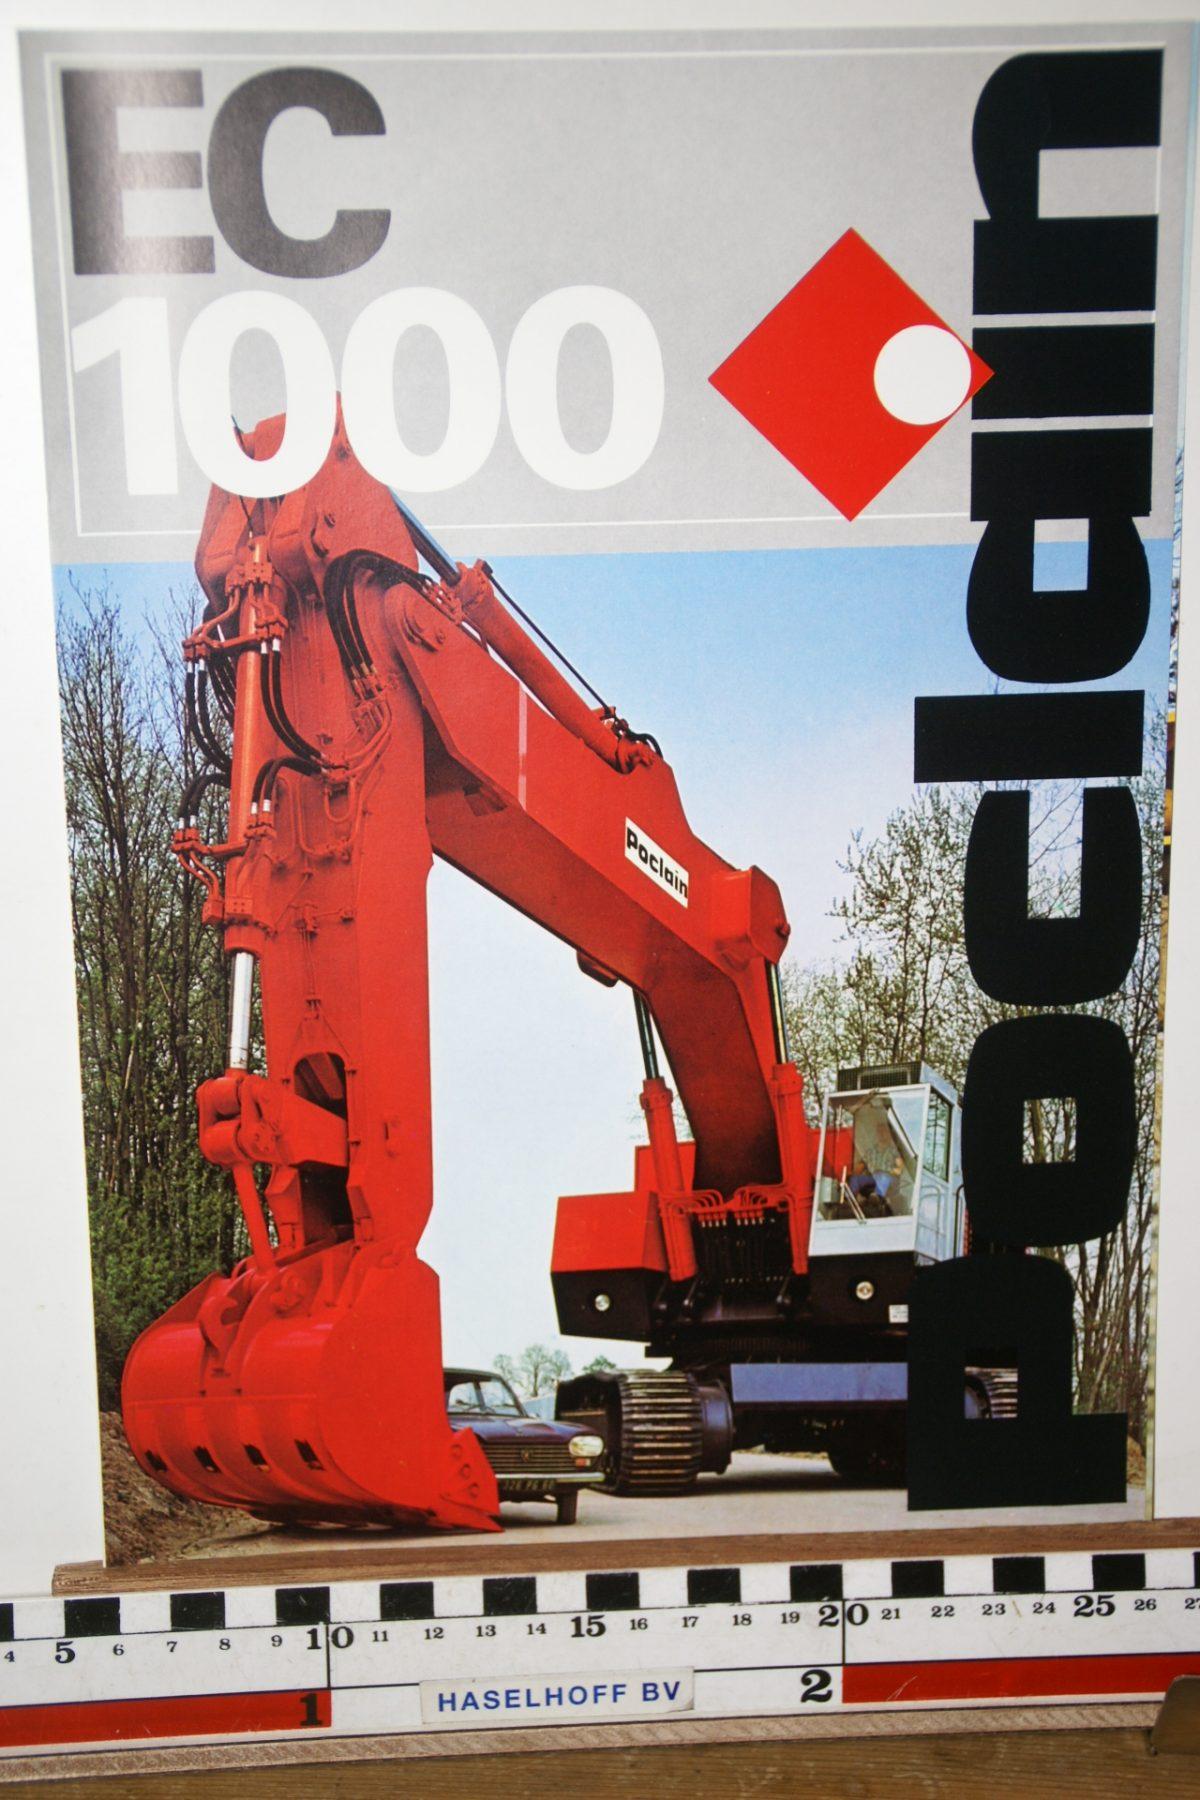 DSC02594 1973 brochure Poclain EC1000 205